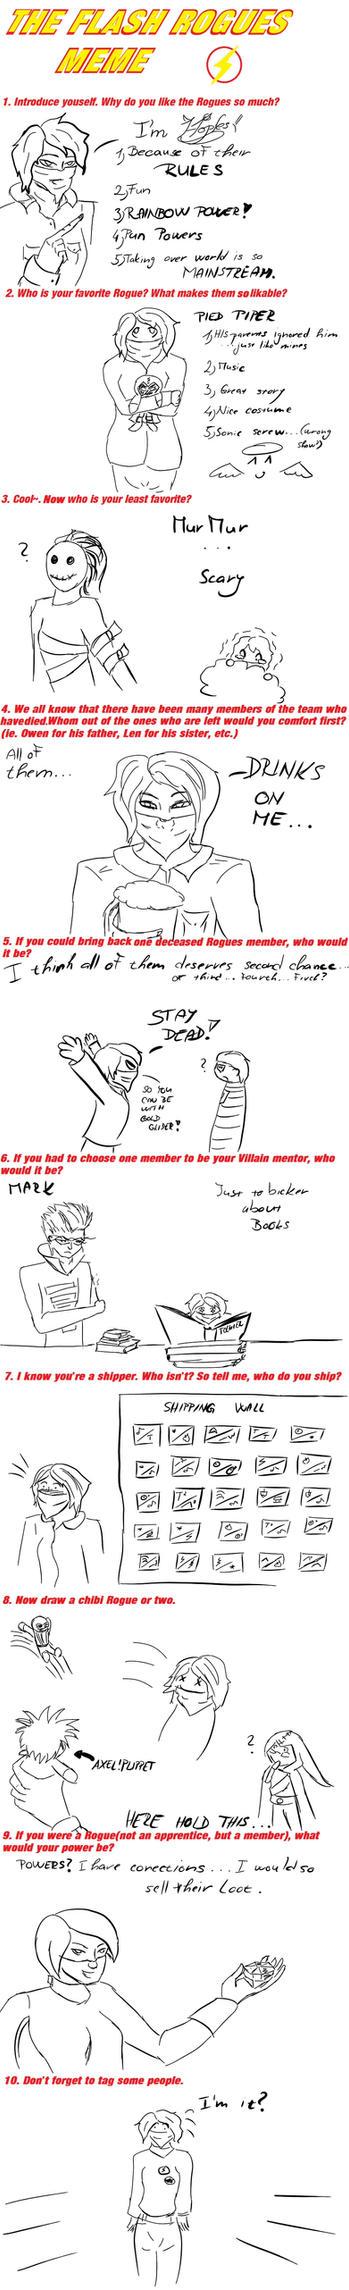 Flash rogue meme by Hoples